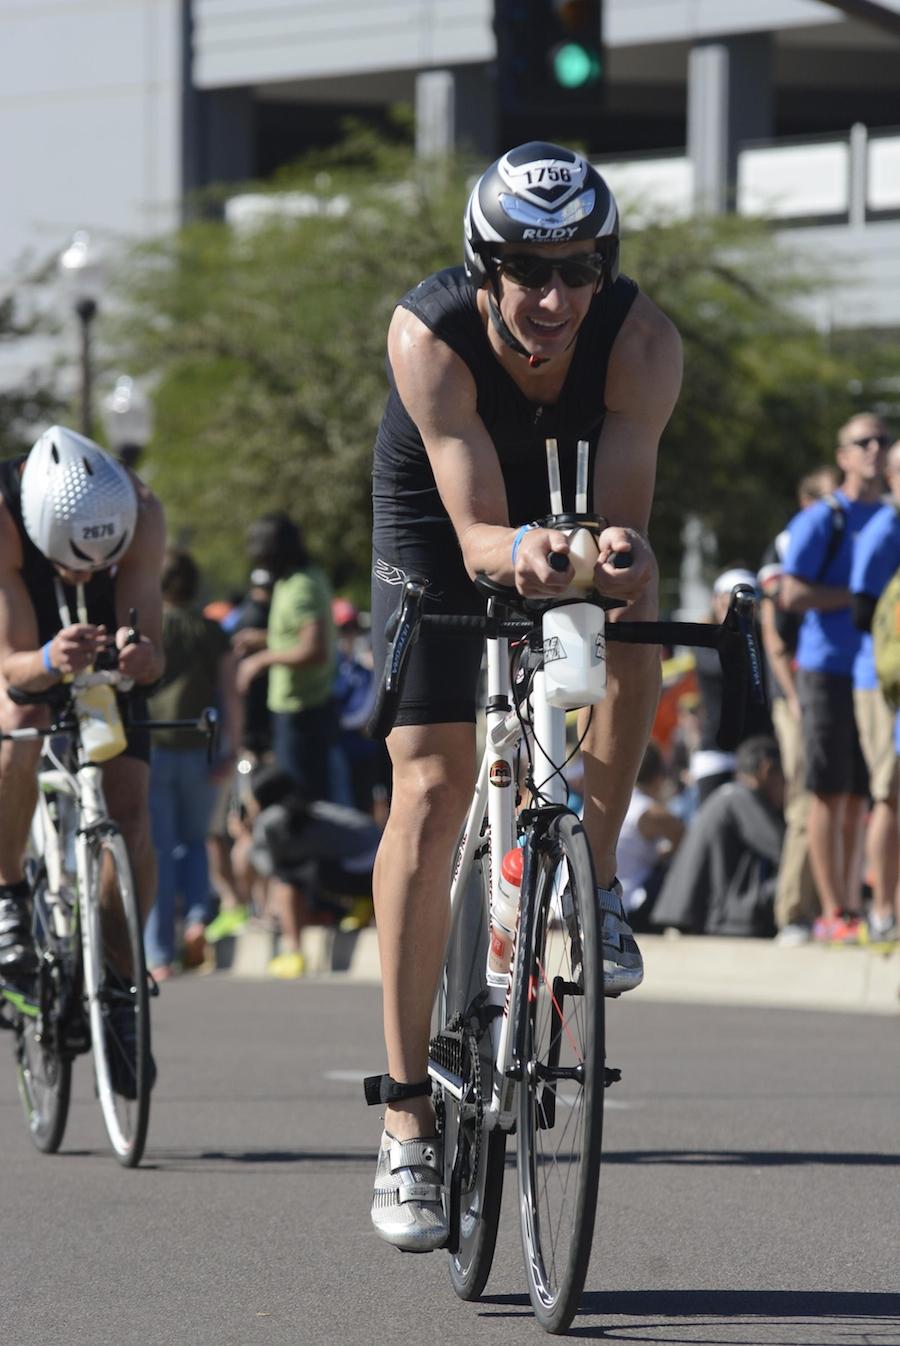 greg_kroleski_ironman_arizona_bike_hurting